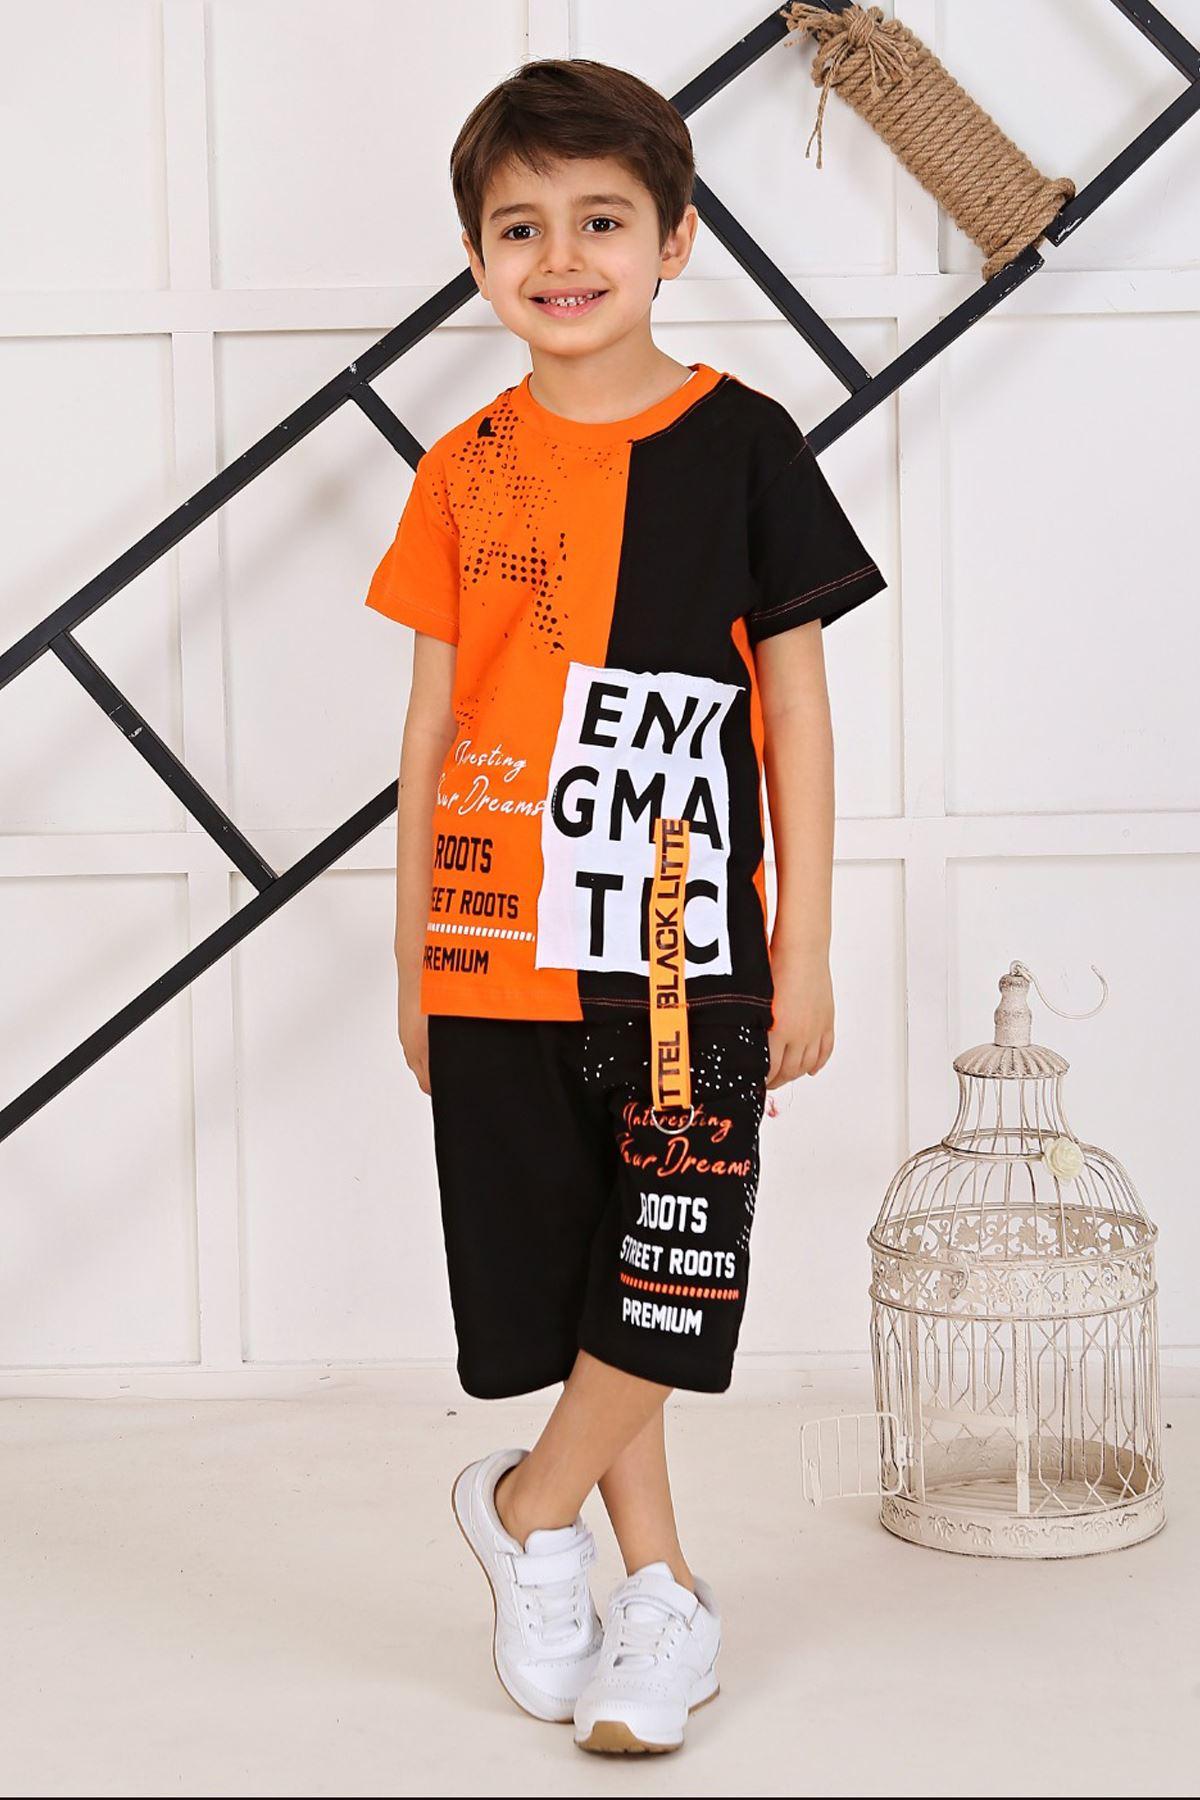 Orenge 2021 Baby Boy Teenage Clothes Suit Summer Male Children T-Shirt Shorts 2Piece Clothing Set Beach Boys outfits Sport Model